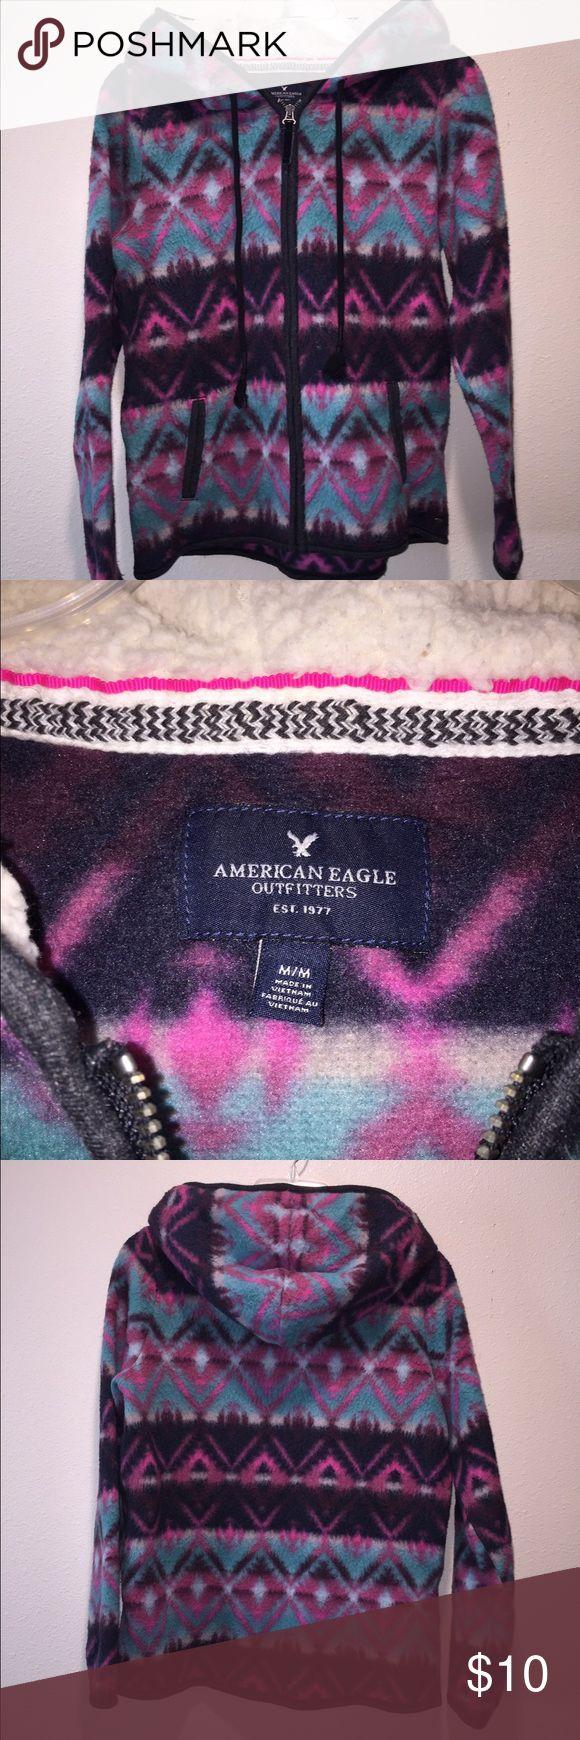 American Eagle Aztec Zip Up Medium Super cute! American Eagle women's Shurpa Lined Aztec Zip Up Sweatshirt Size Medium American Eagle Outfitters Jackets & Coats